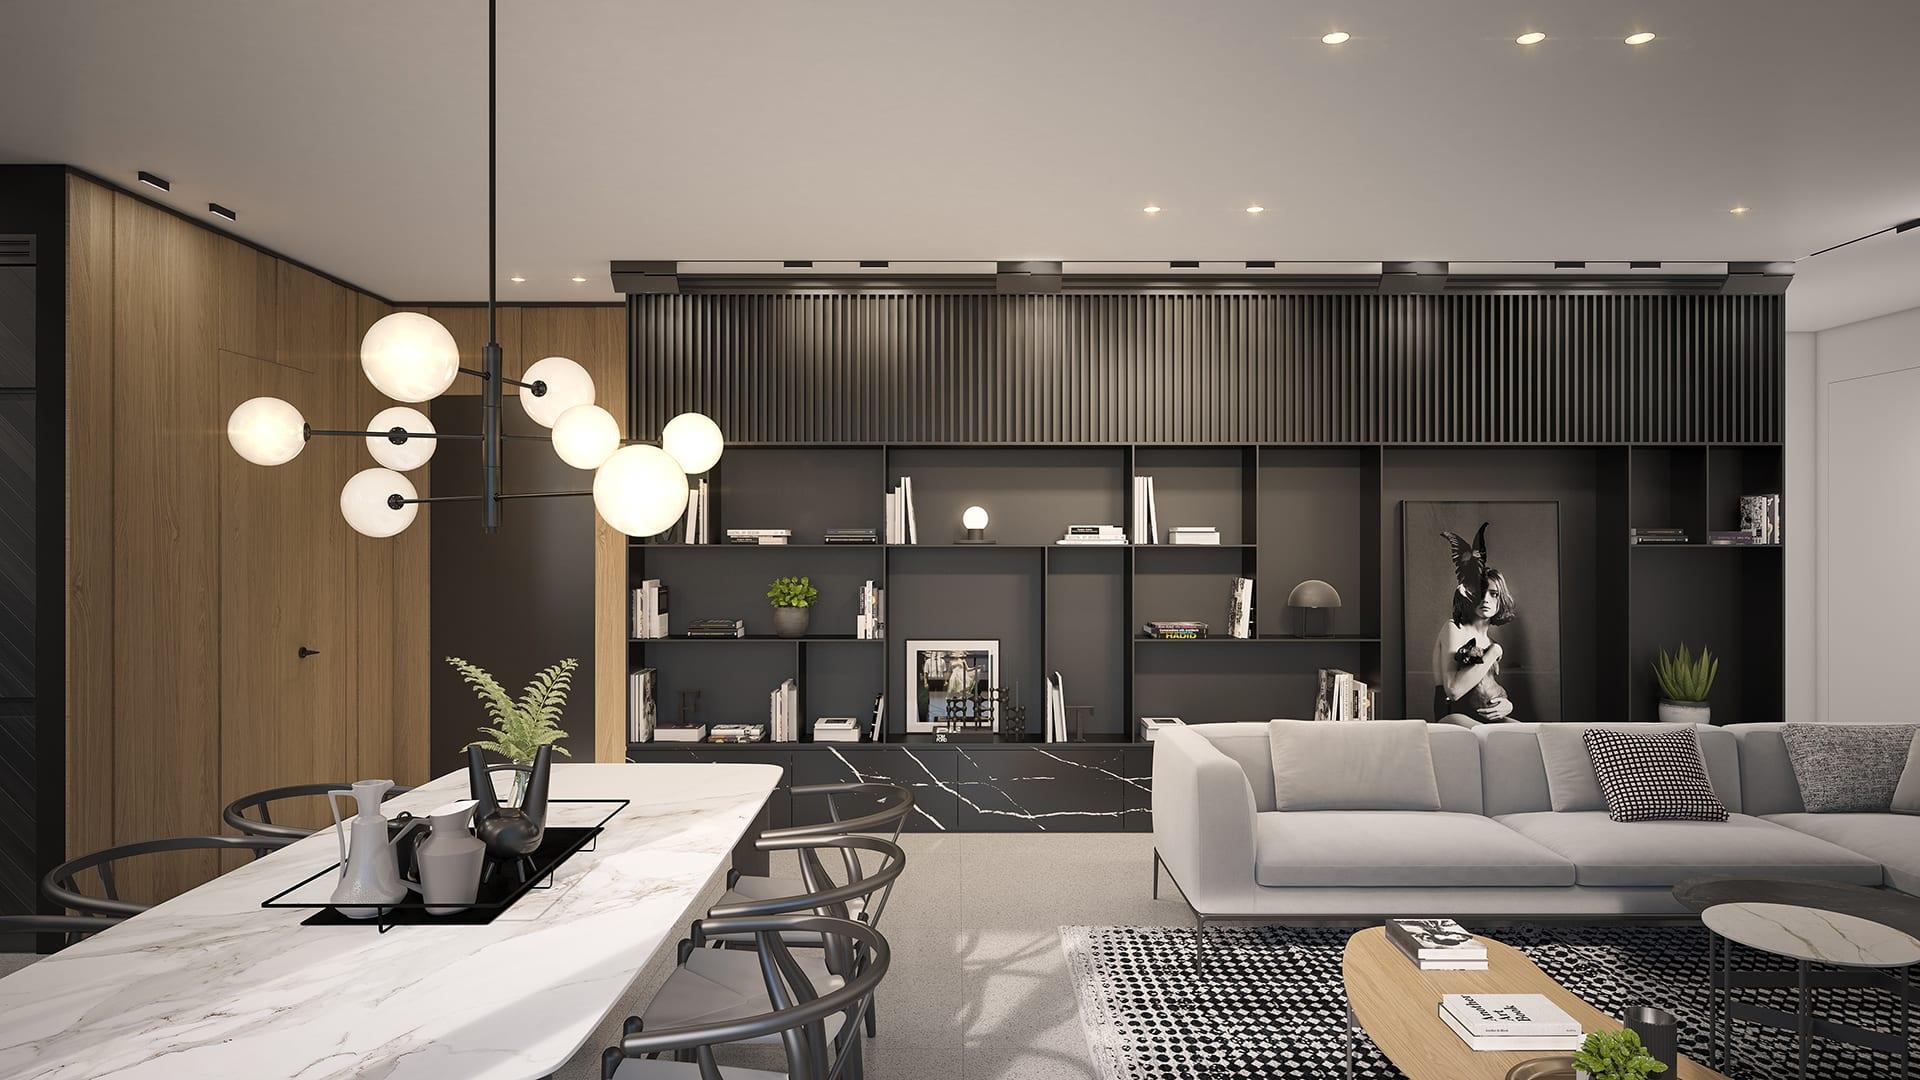 Maayan-Golan_Architectural-Visualization_apartment_kitchen-living-room-visualization_interior-design-sharon-maayan_02